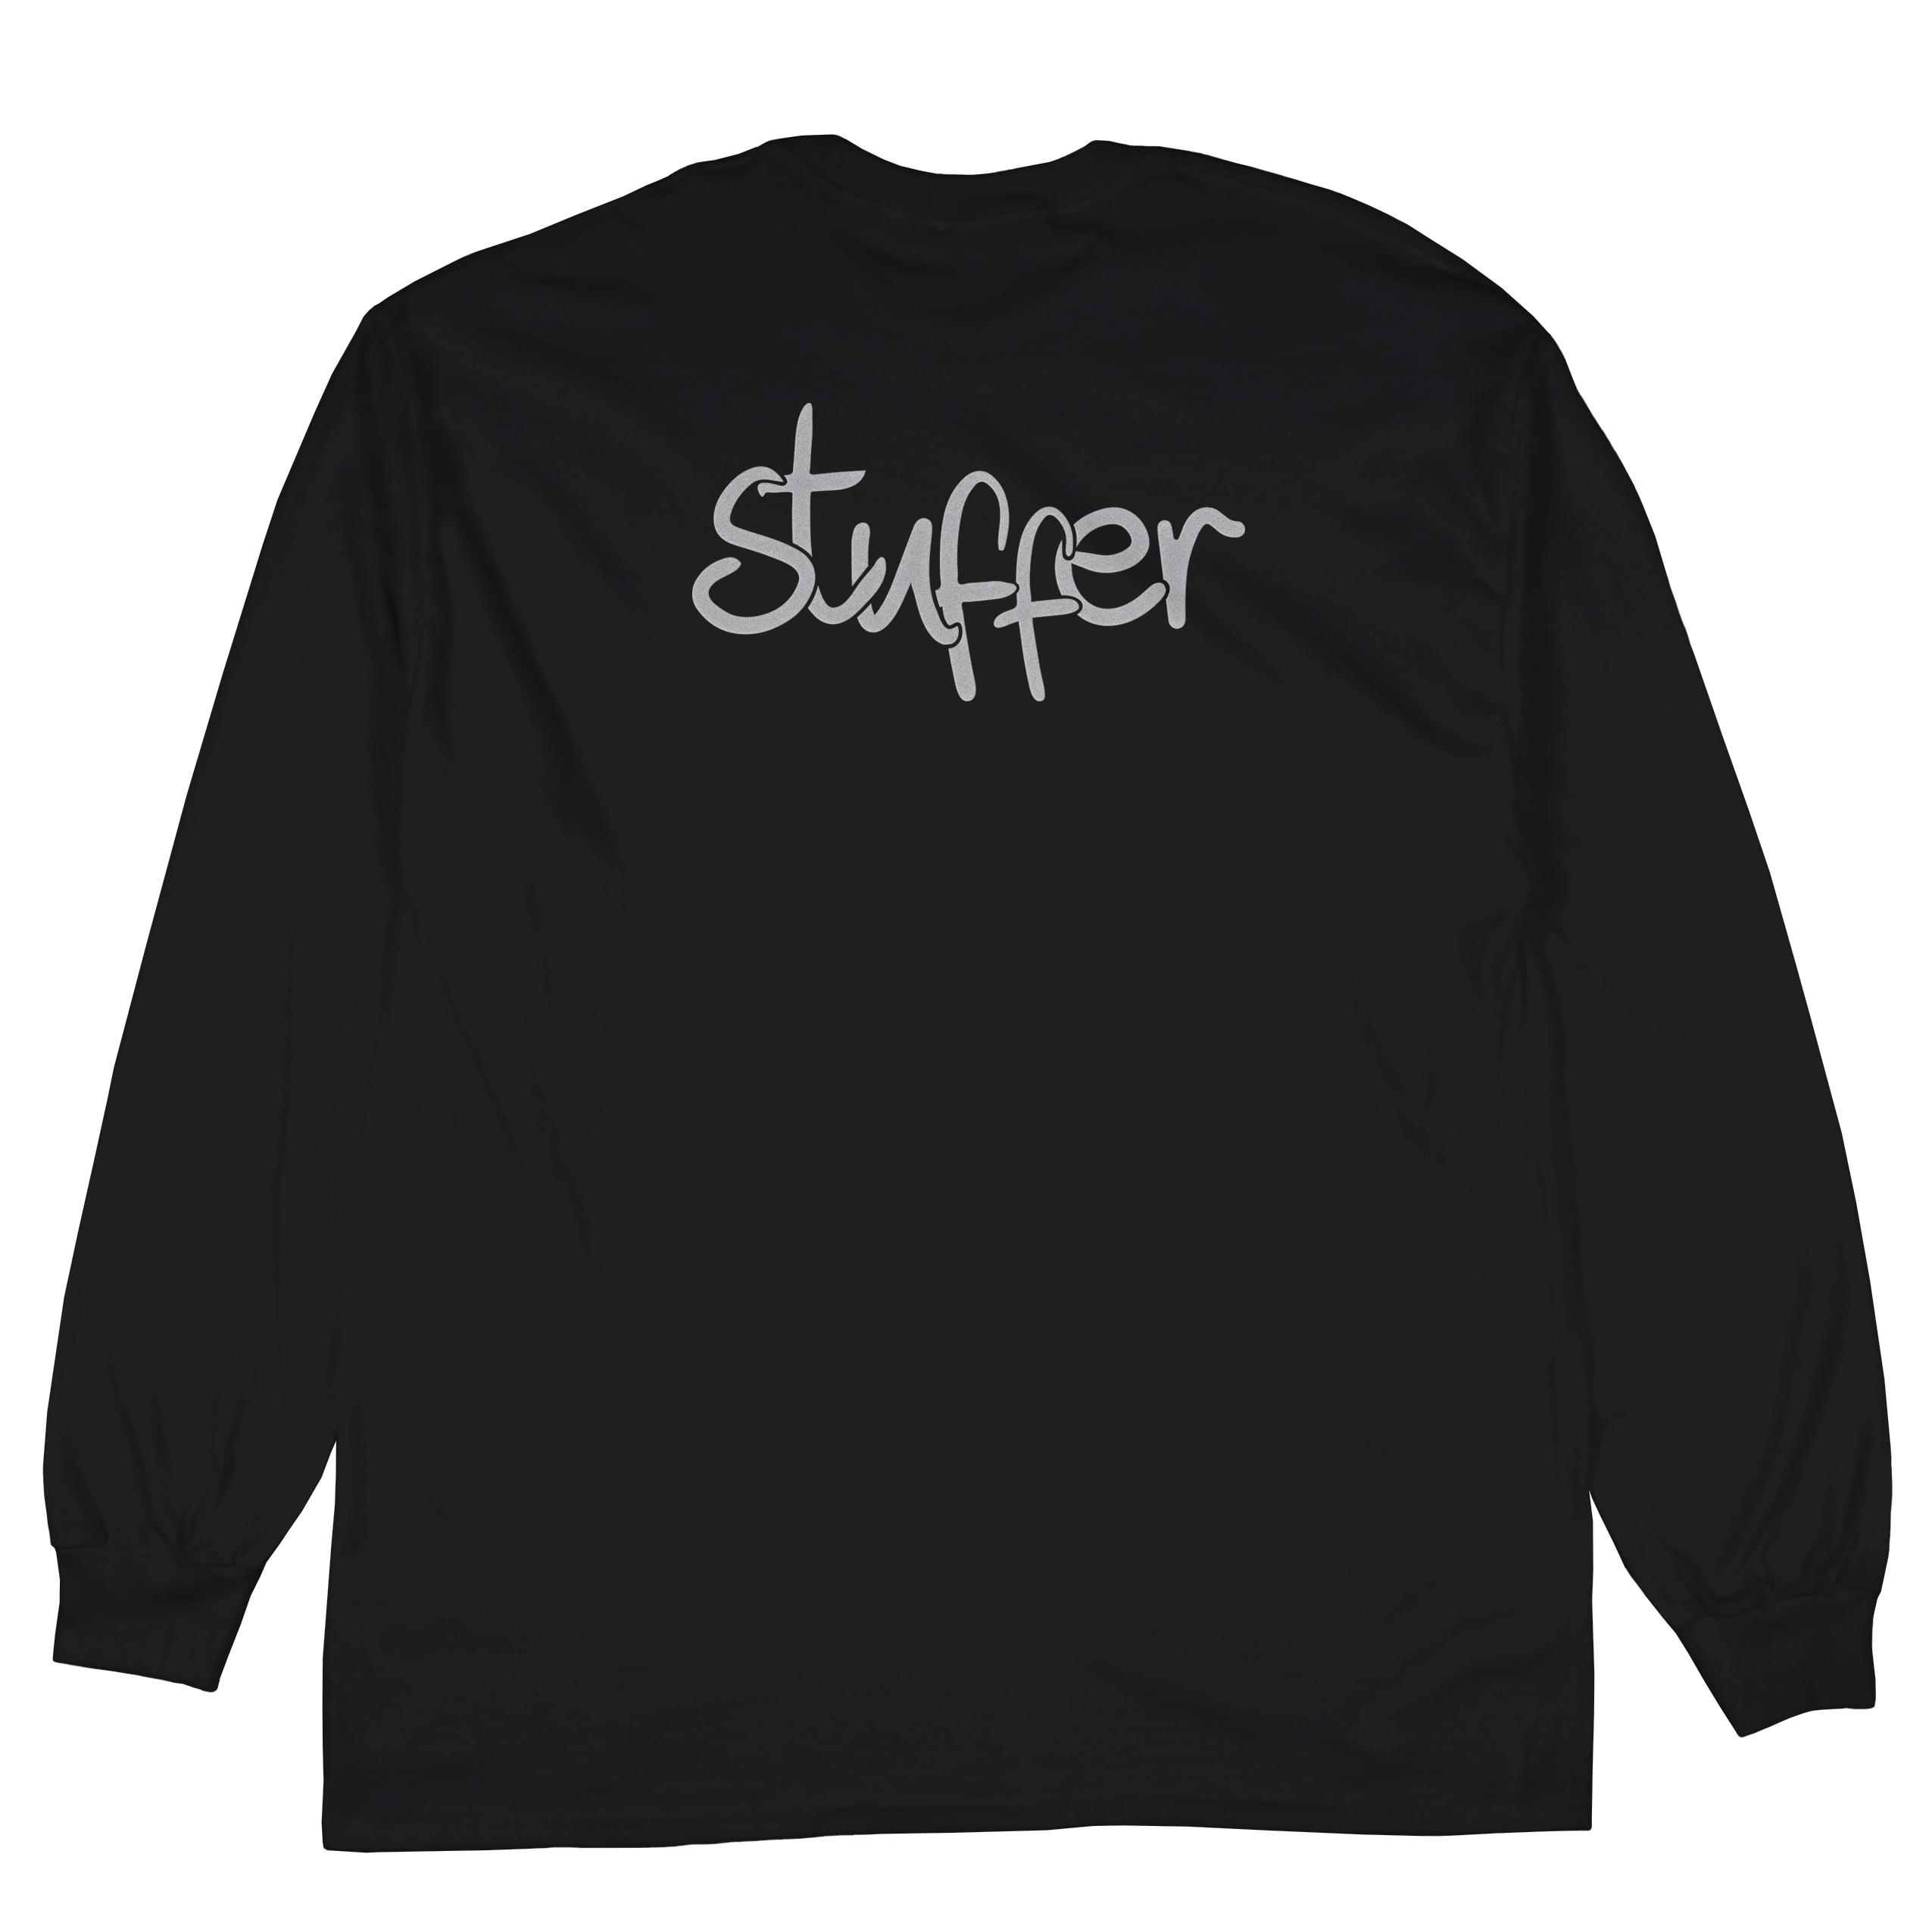 STUFFER REFLECTIVE LOGO L (BLACK)